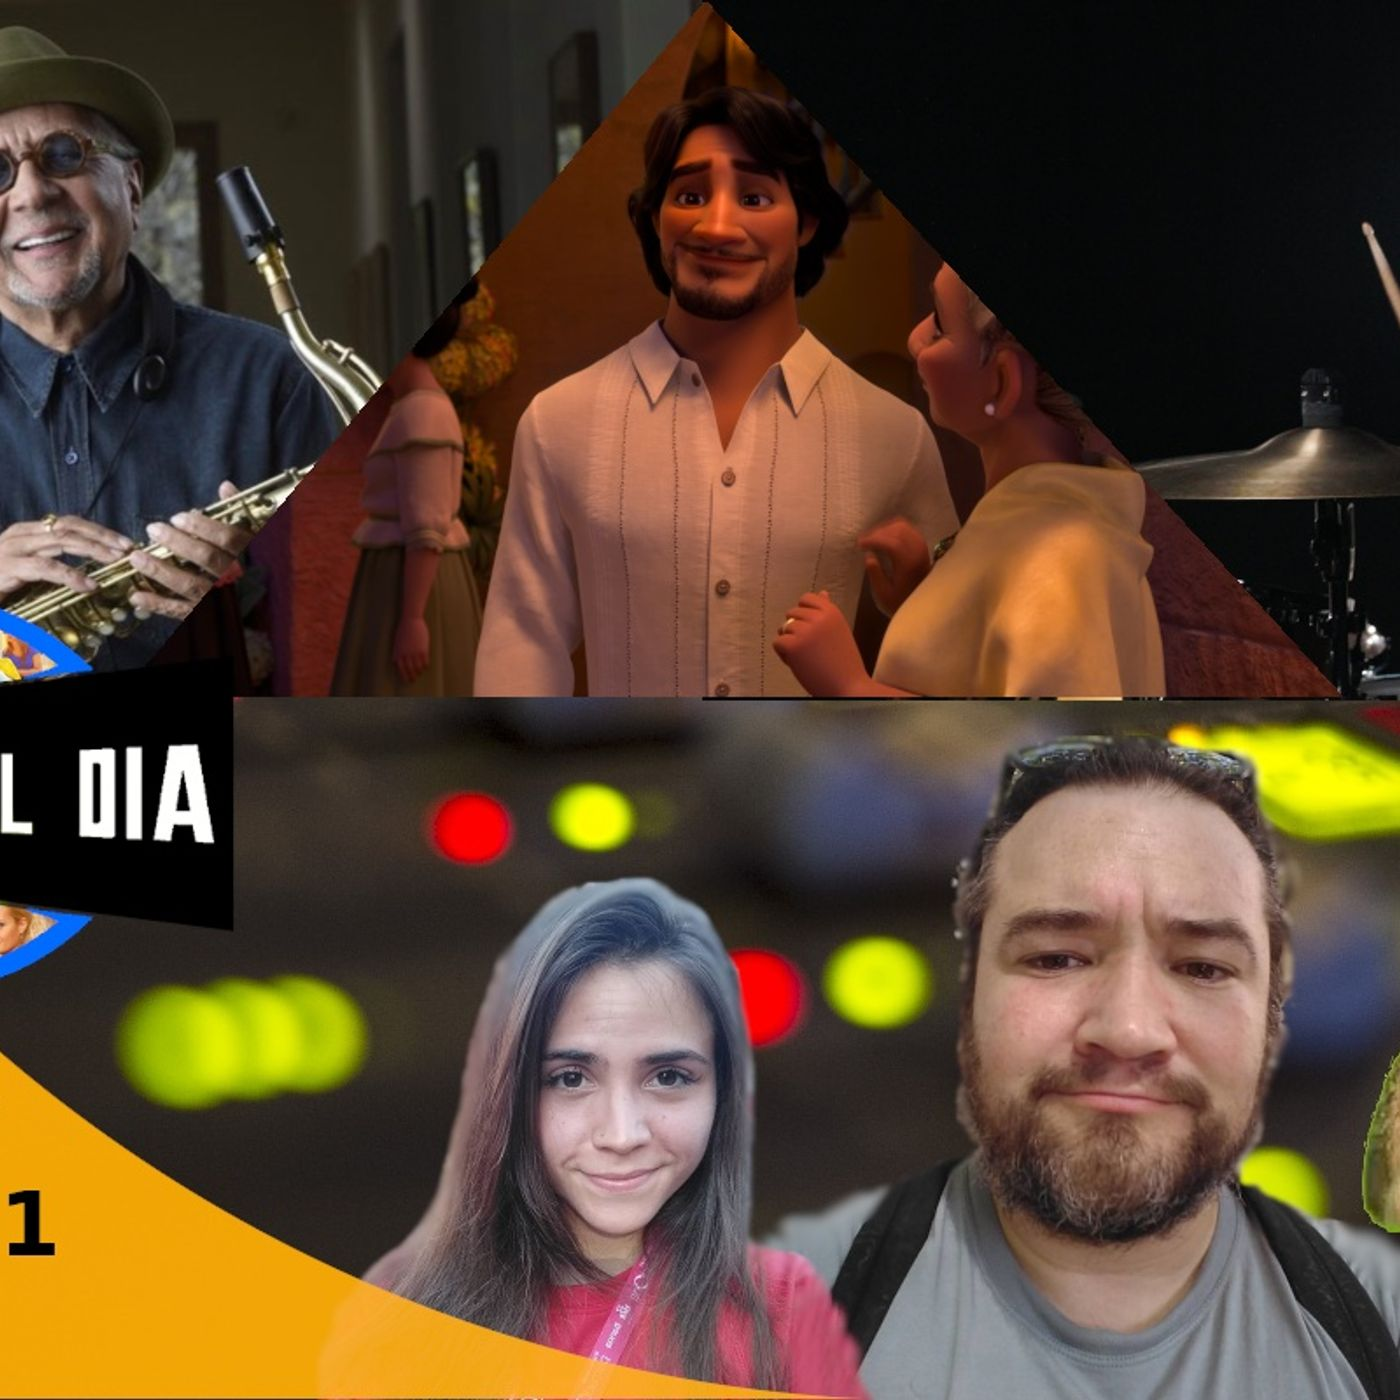 Encanto   Amazon GAMERGY World   Ponte al día 514 (25/10/21)